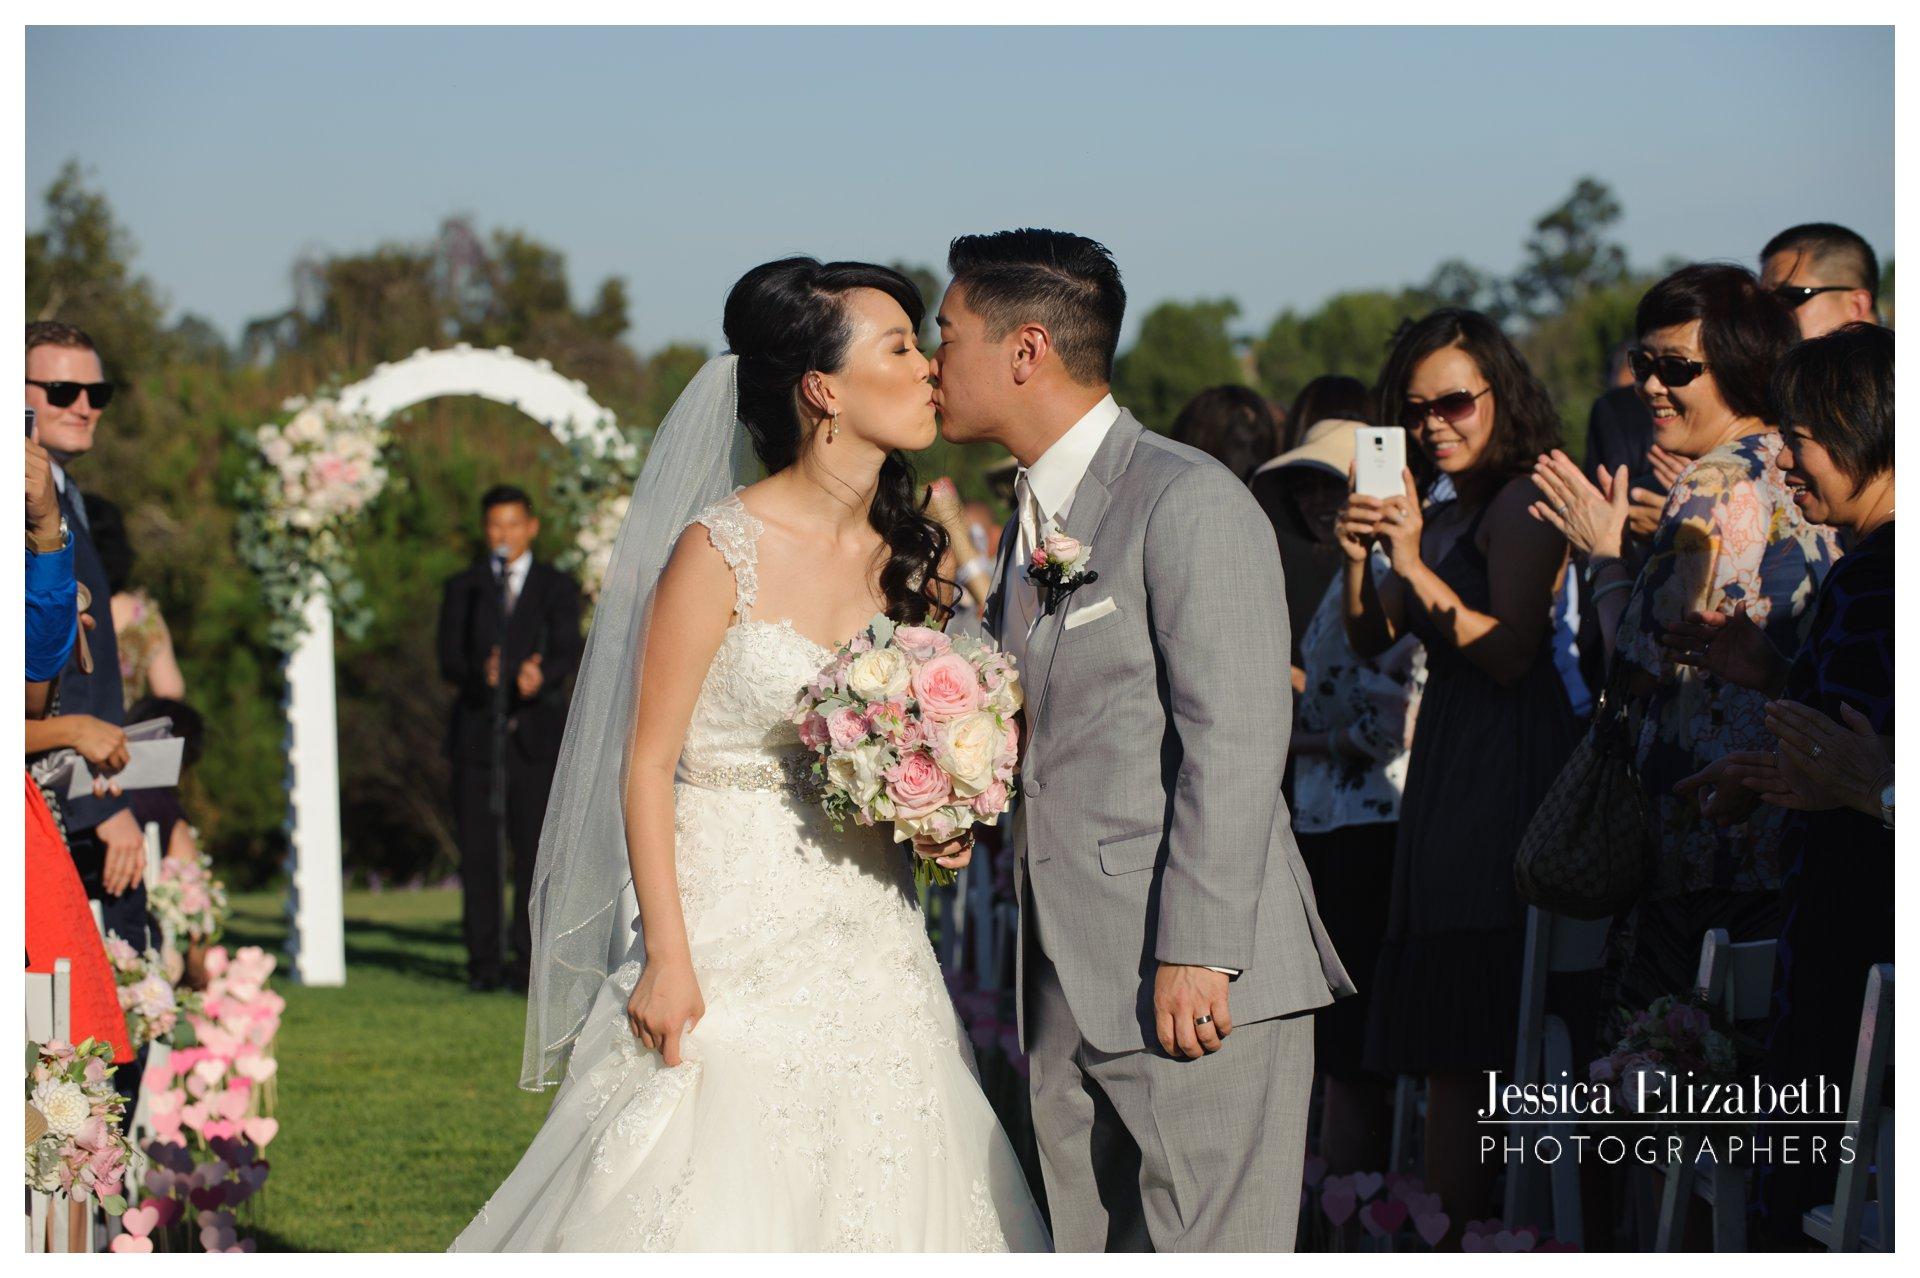 22-South Coast Botanic Garden Palos Verdes Wedding Photography by Jessica Elizabeth